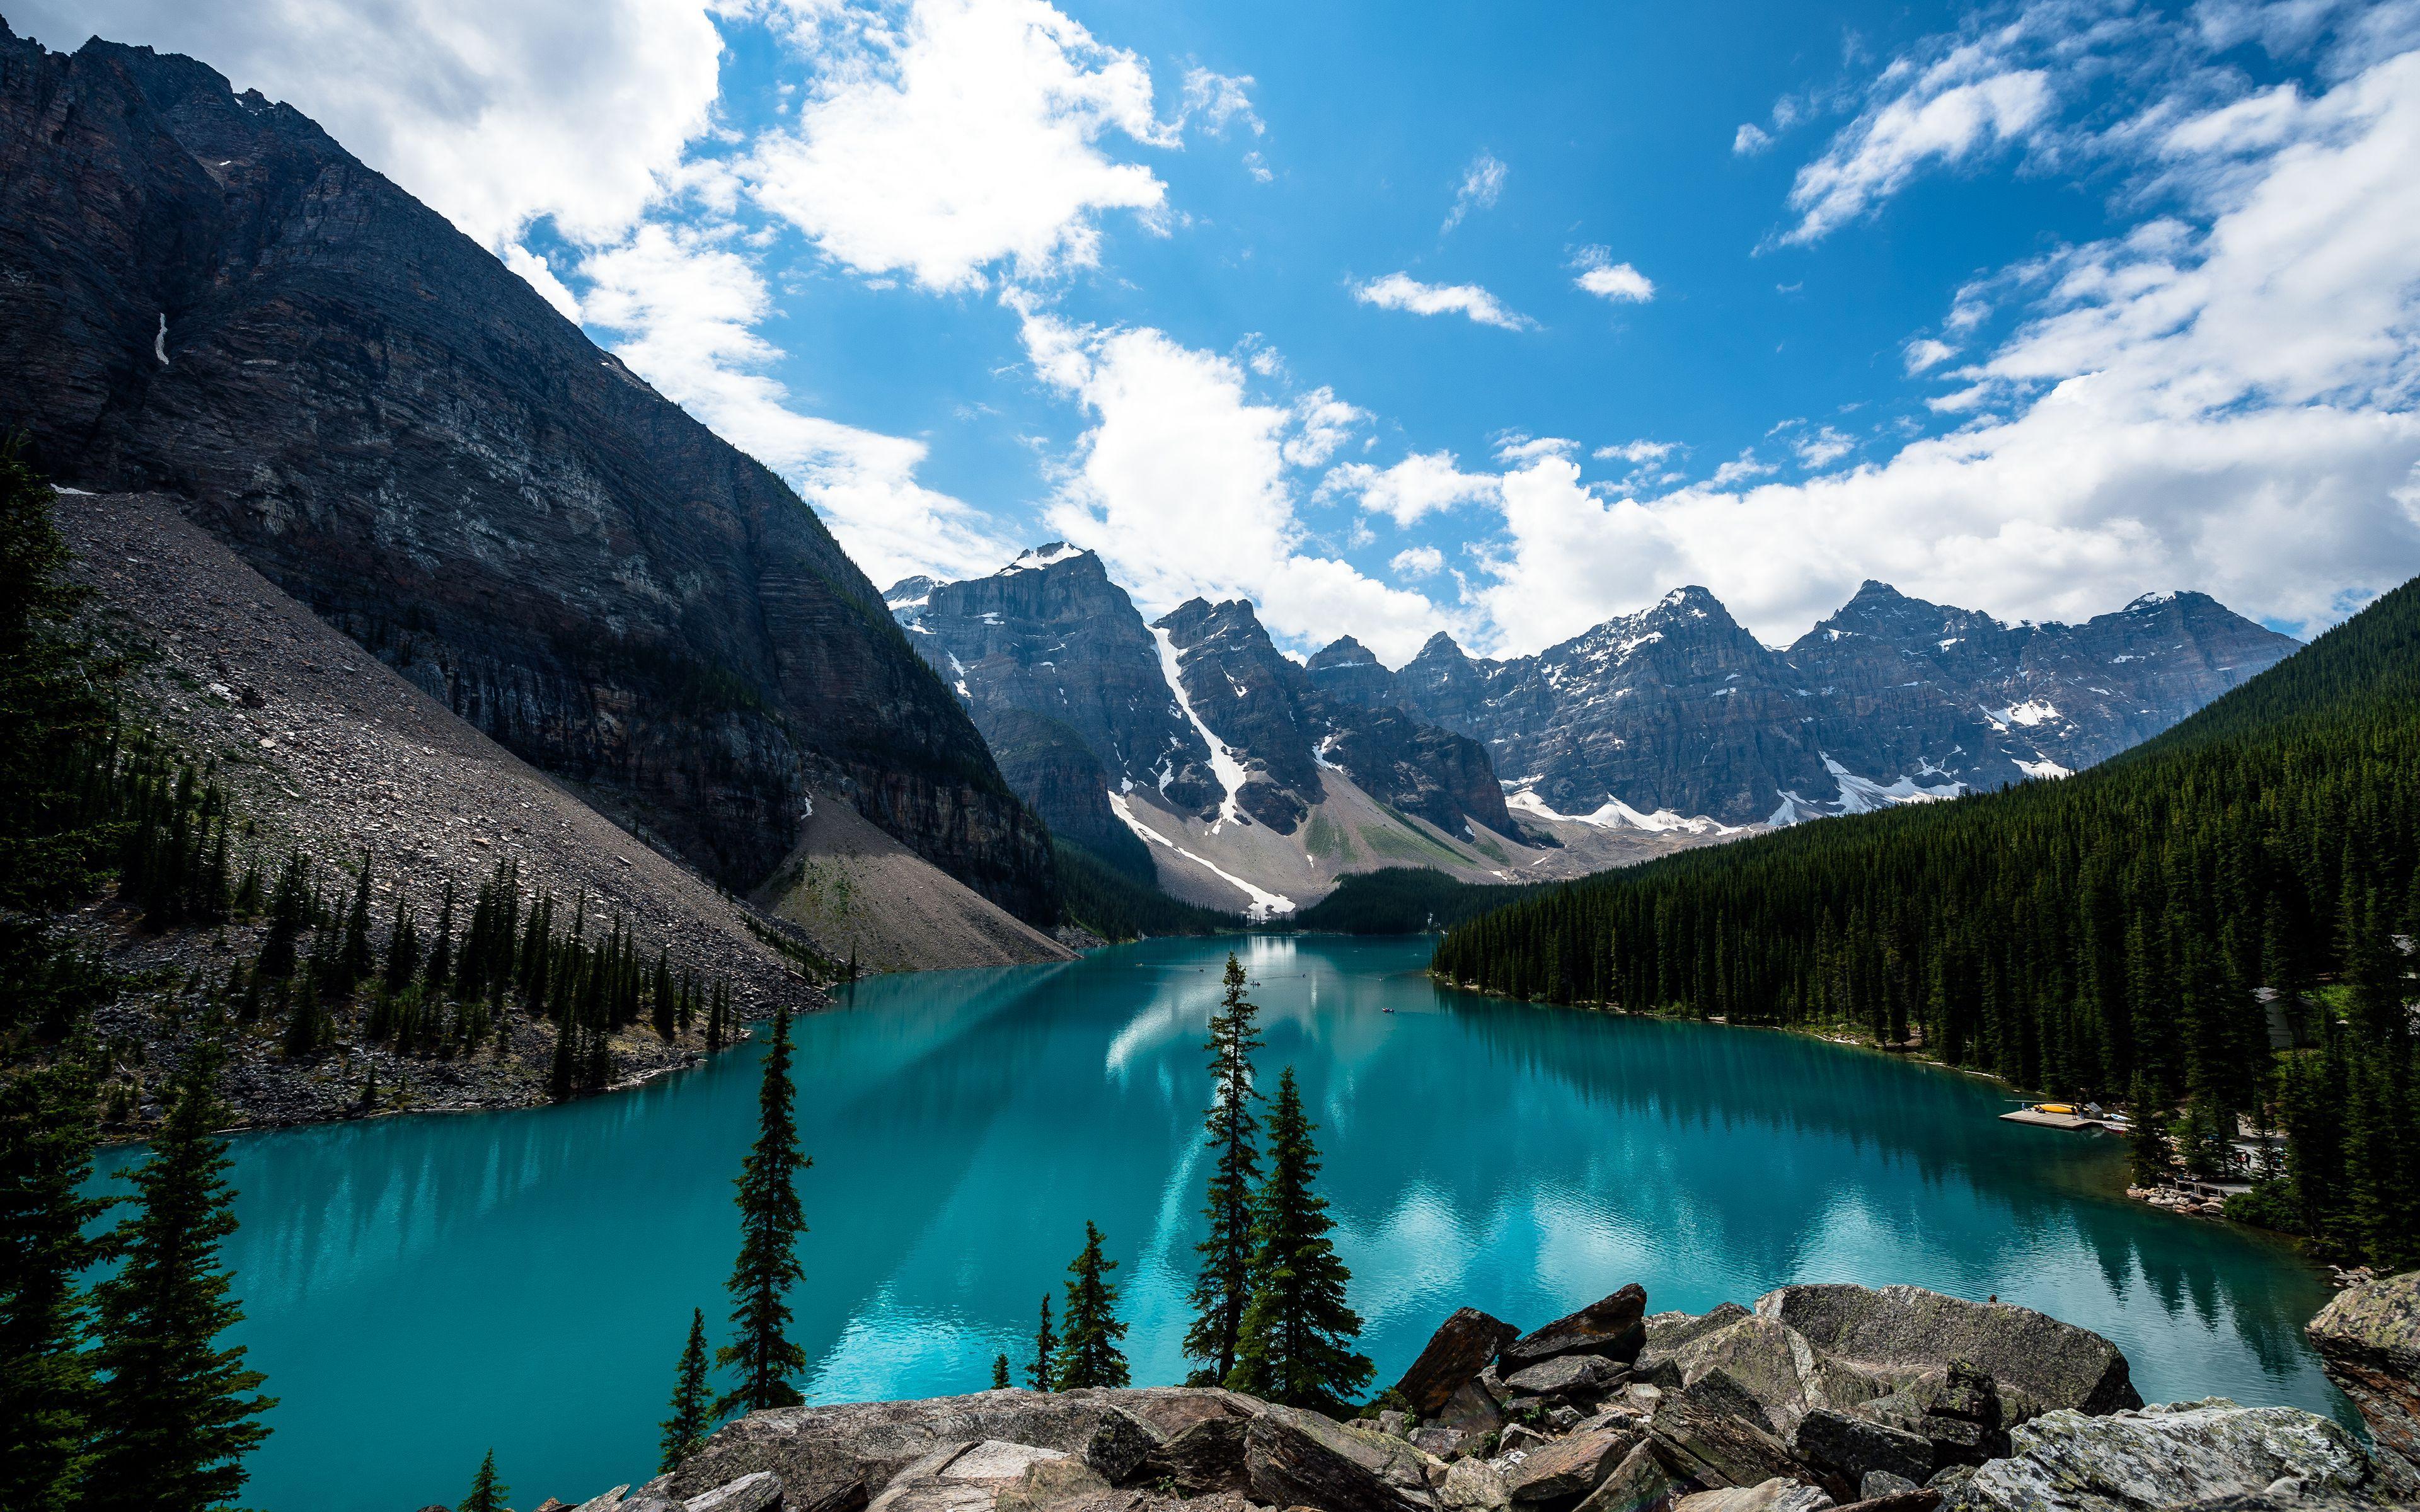 Canada Landscape Wallpapers Top Free Canada Landscape